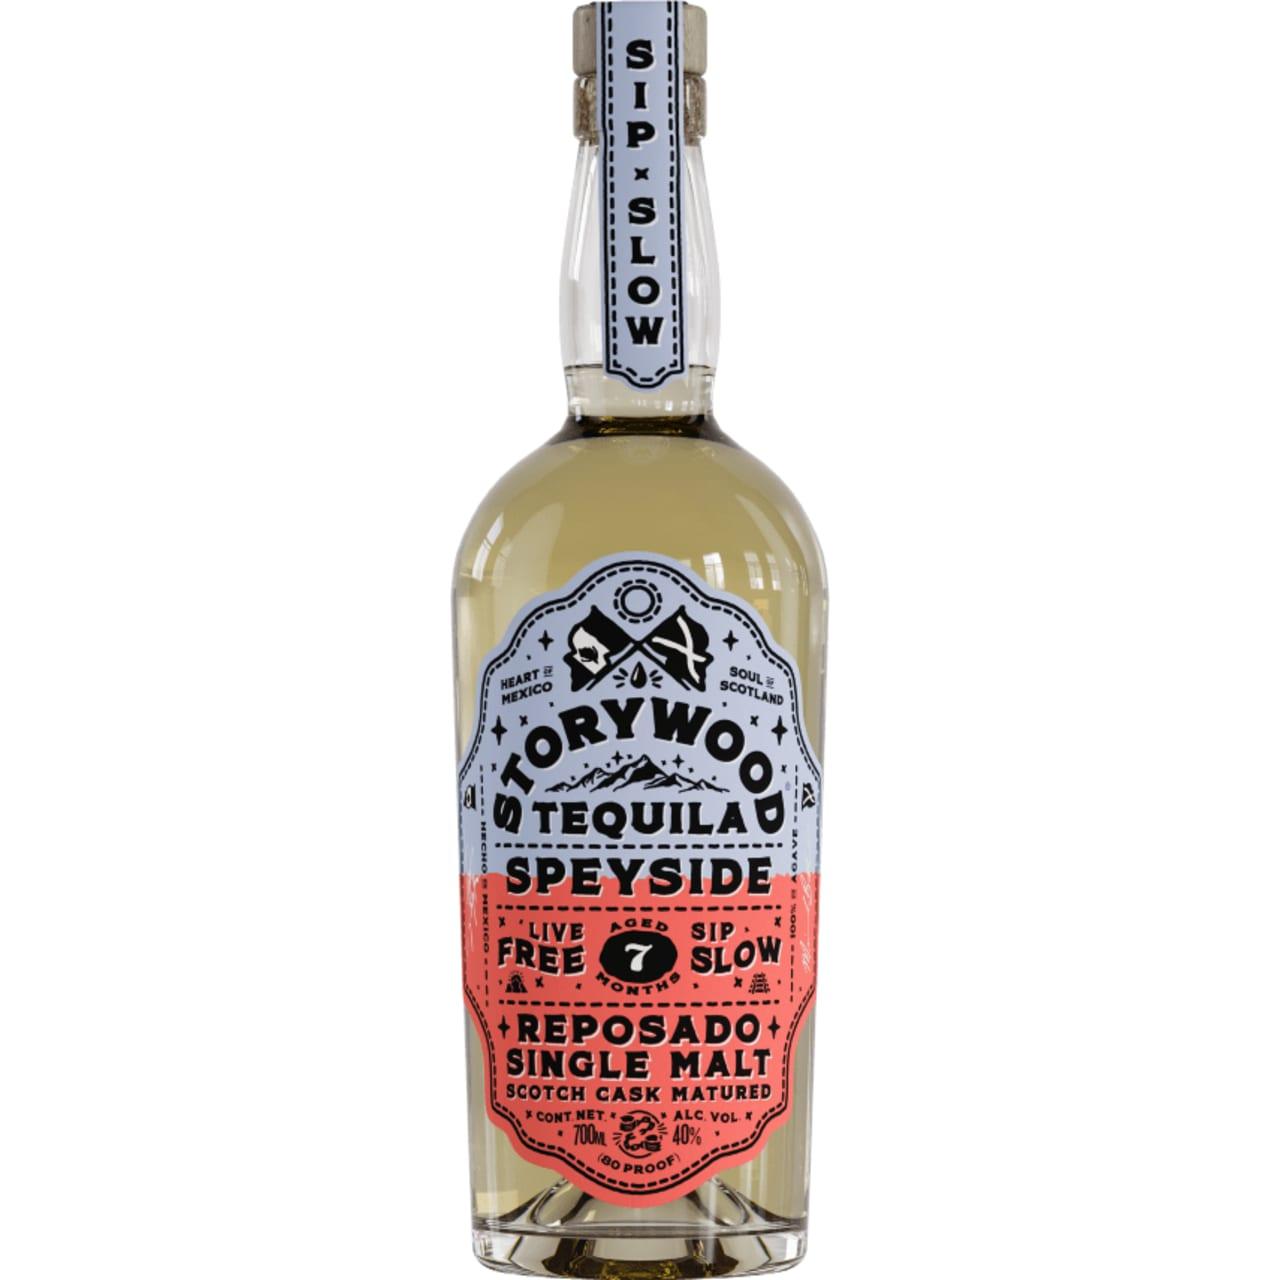 Product Image - Storywood Speyside 7 Tequila